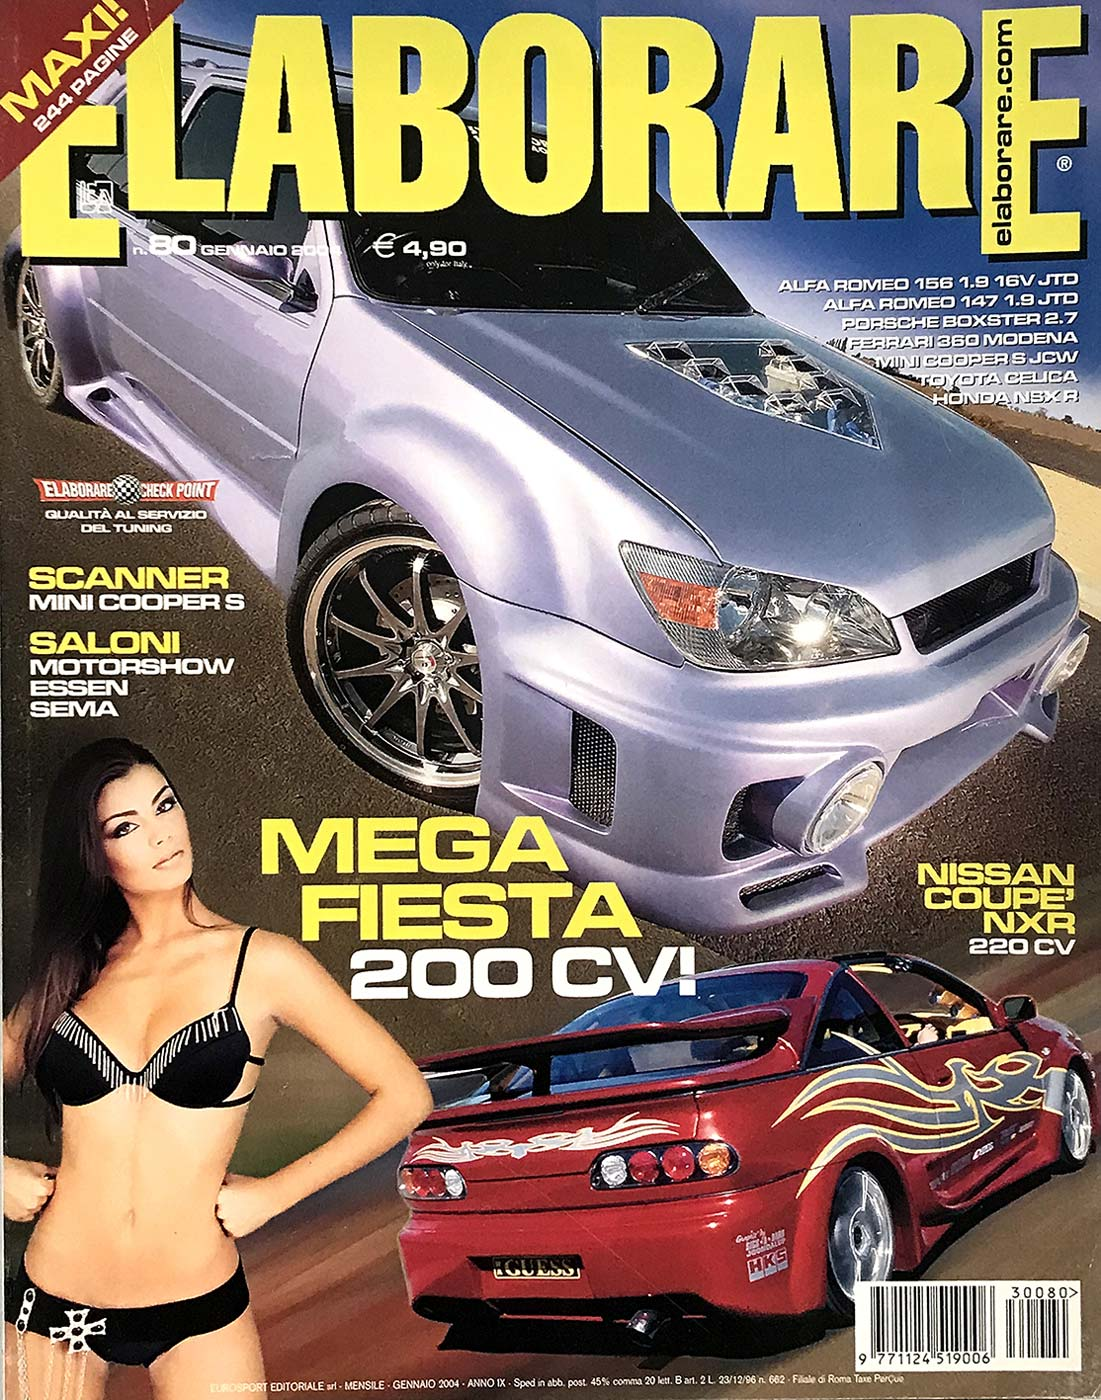 Elaborare n° 80 Gennaio 2004